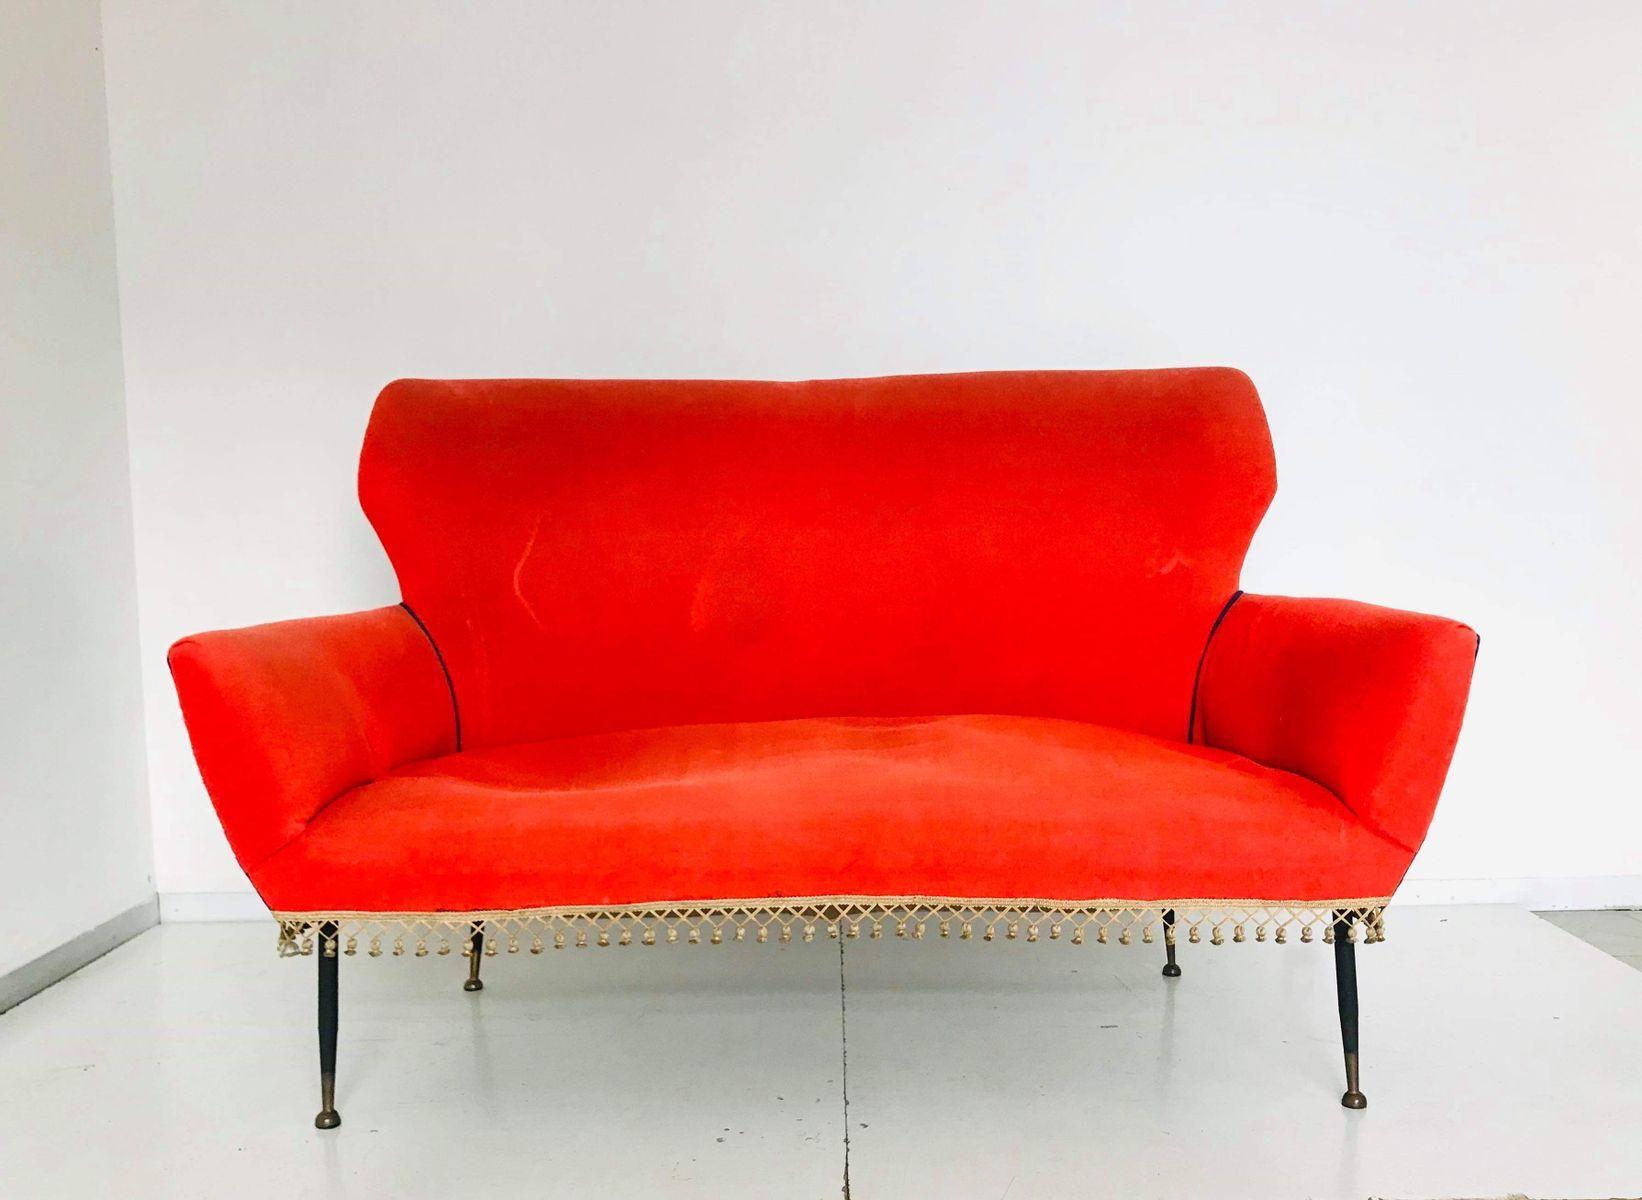 Klippan Sofa Leder Rot Schoner Wohnen Sofa Grau Design Sofa Cushion Covers Sofas Designer Schlafsofa Fede Schlafsofa Federkern Sofa Leder 2 Sitzer Sofa